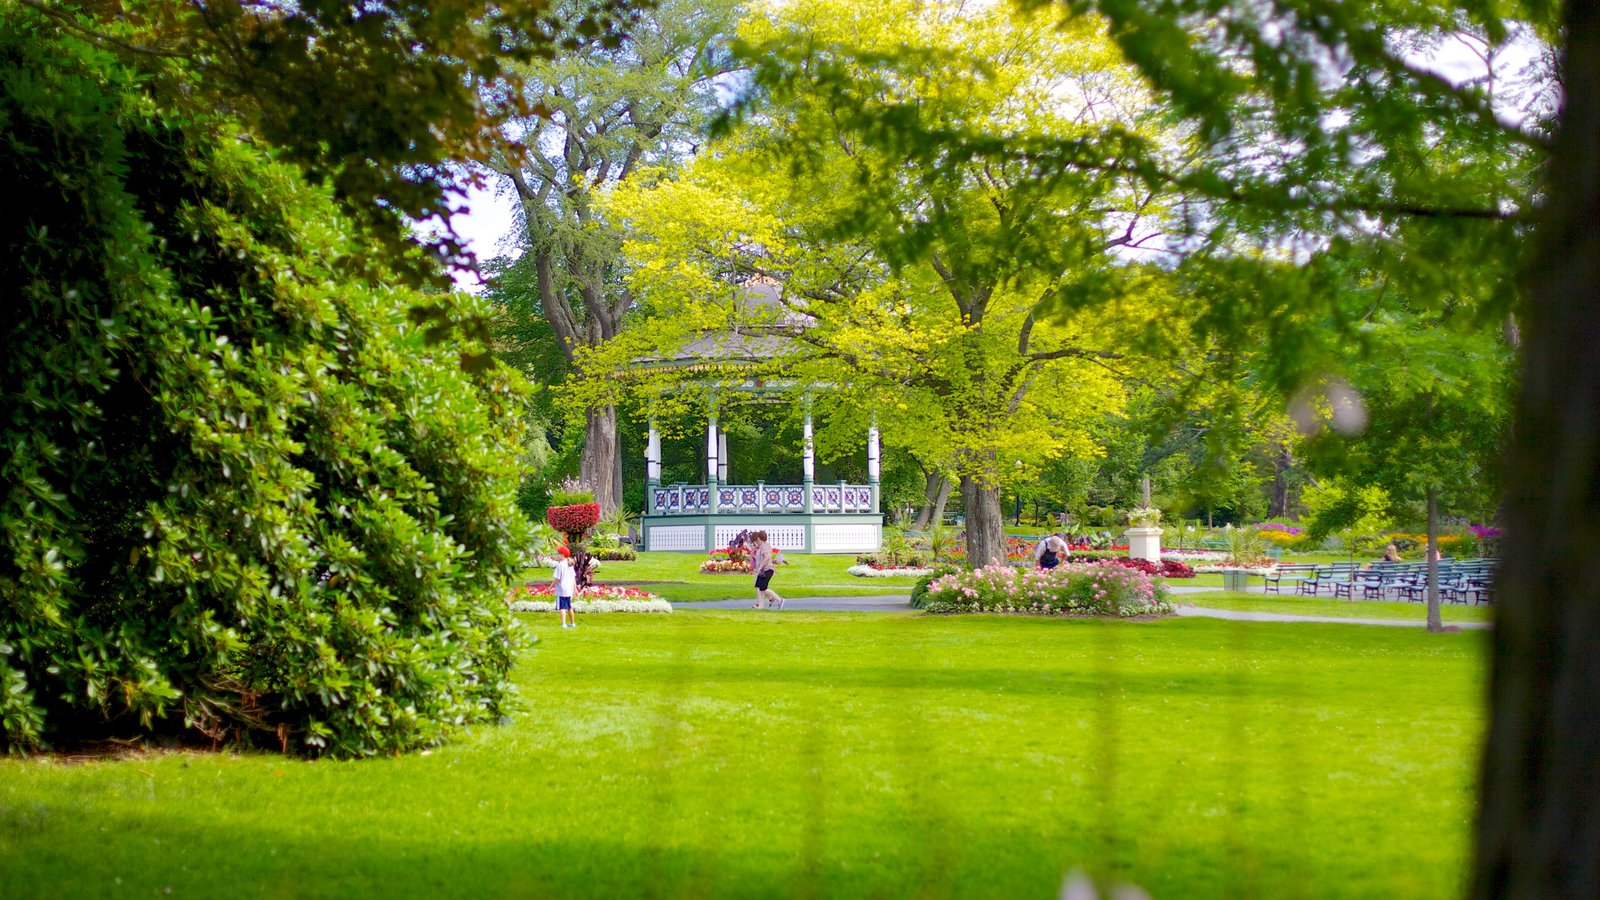 Fotos de jardines p blicos halifax ver fotos e im genes for Ver fotos de jardines